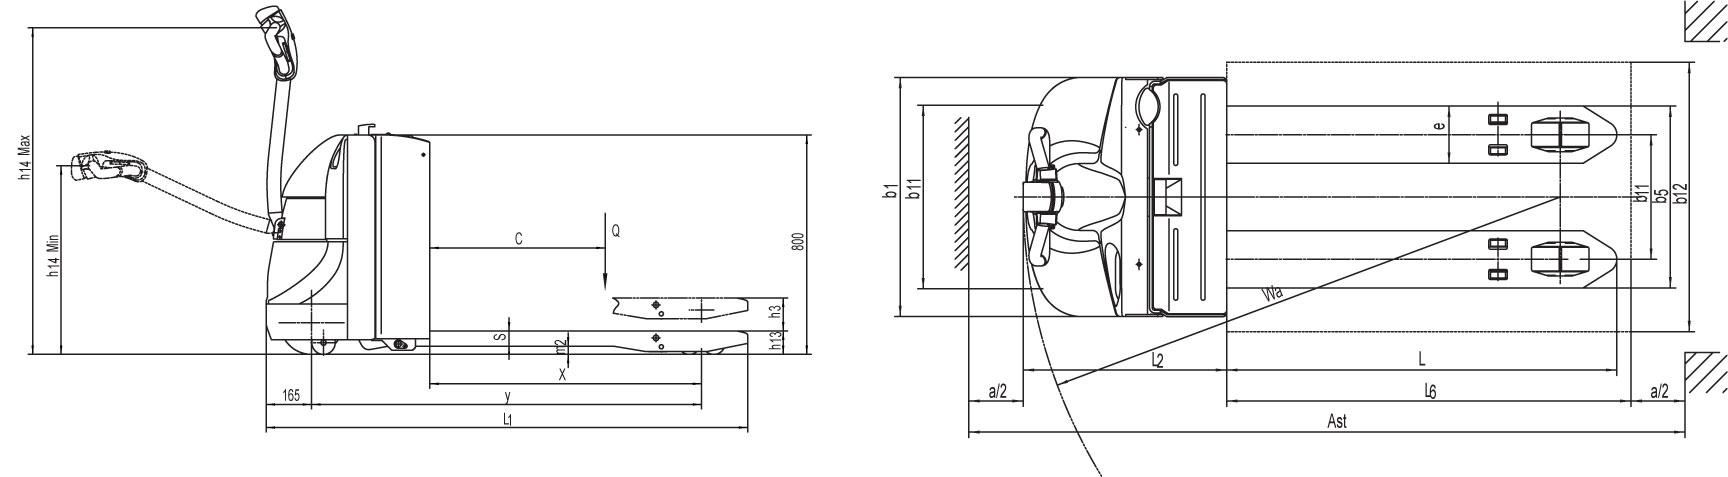 draw.jpg (77 KB)